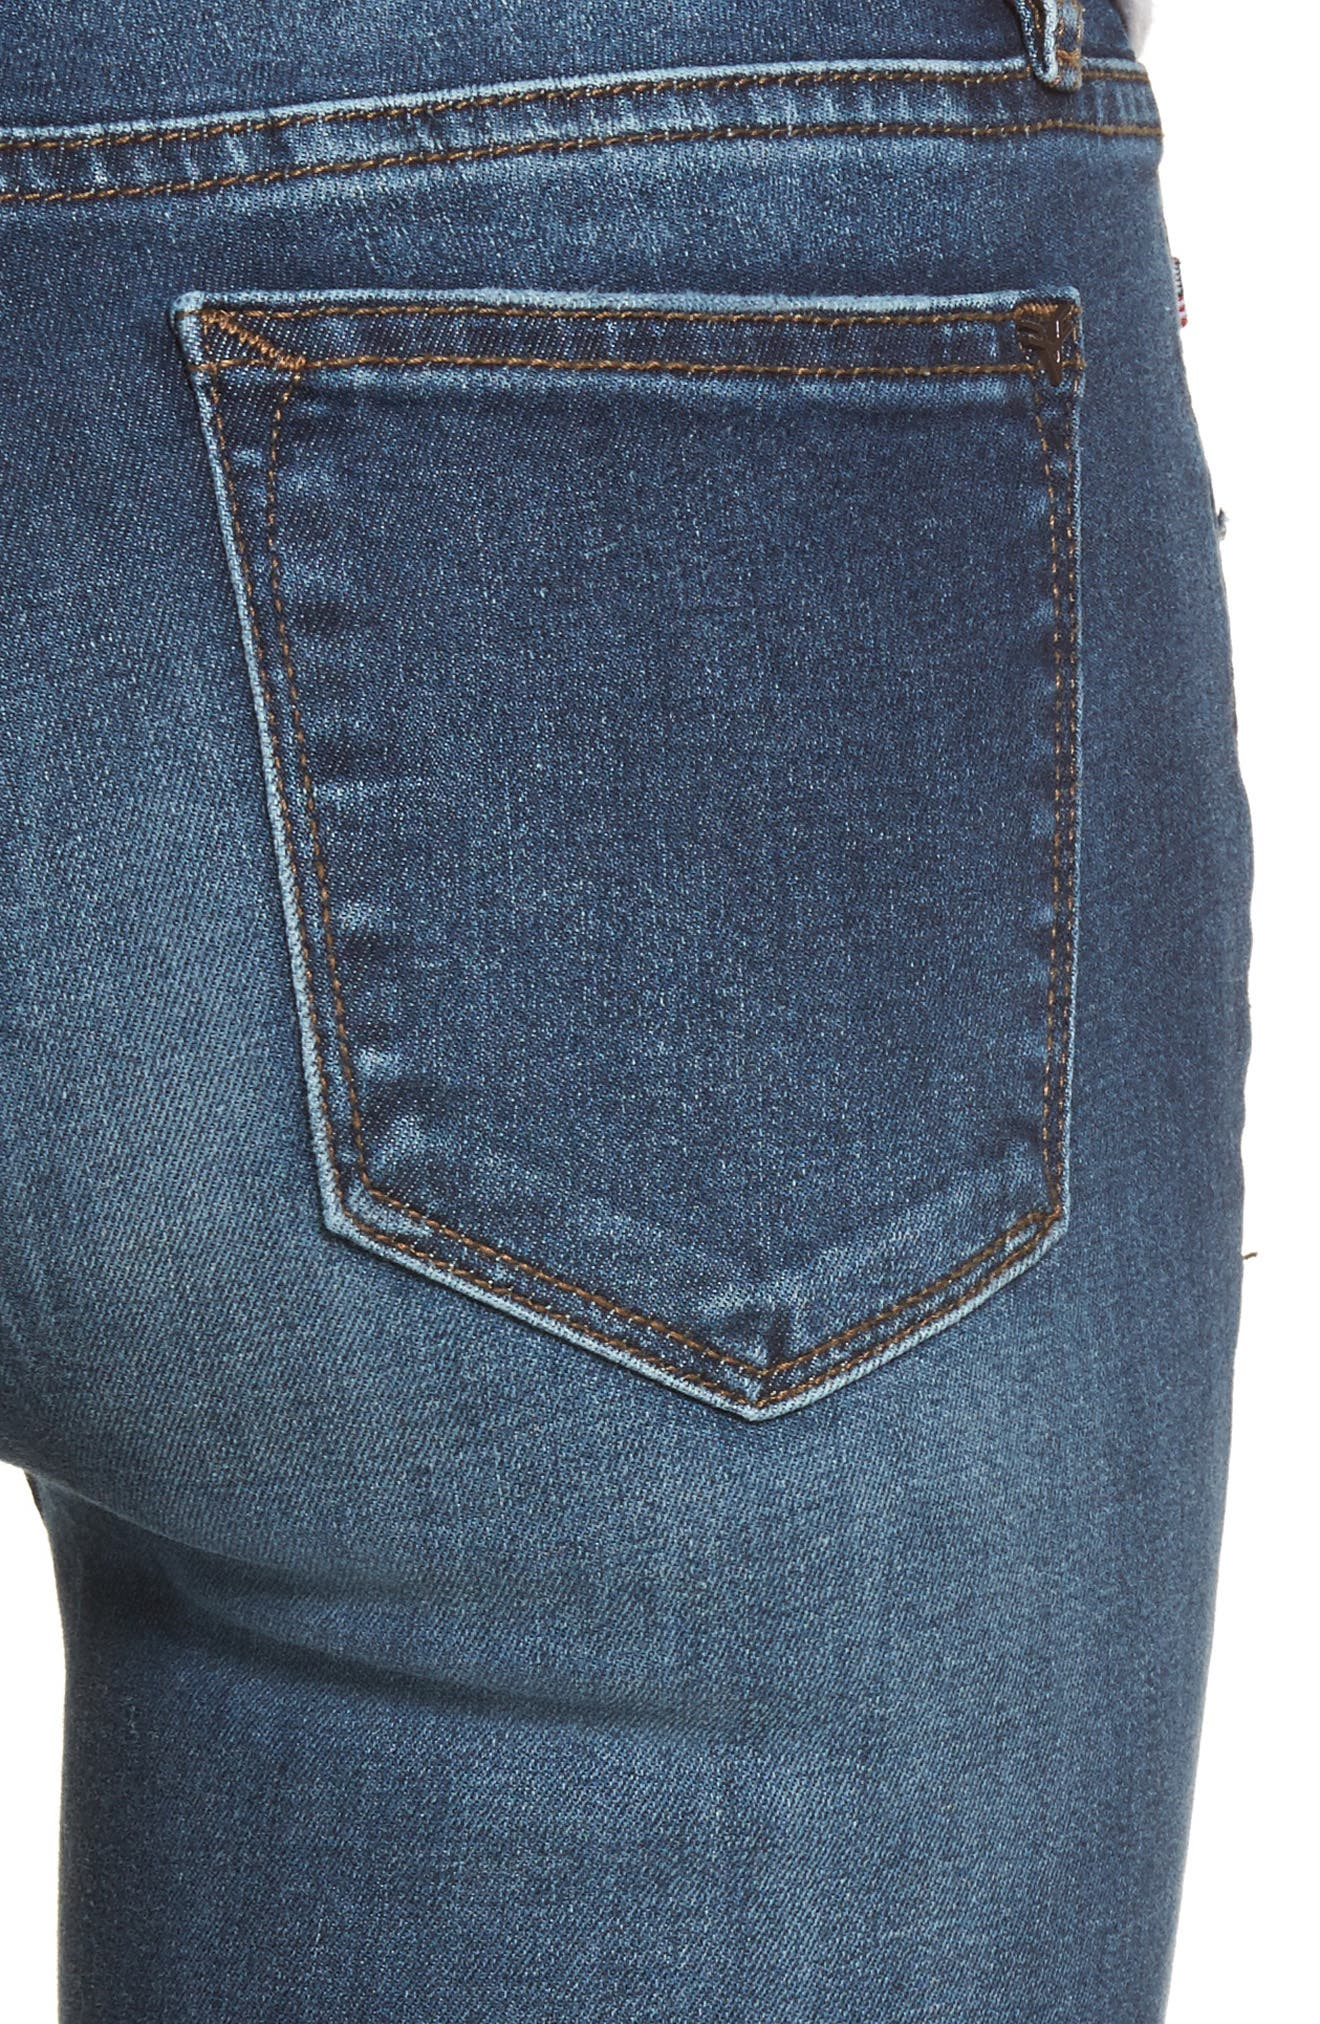 Jagger Distressed Skinny Jeans,                             Alternate thumbnail 4, color,                             Dark Wash